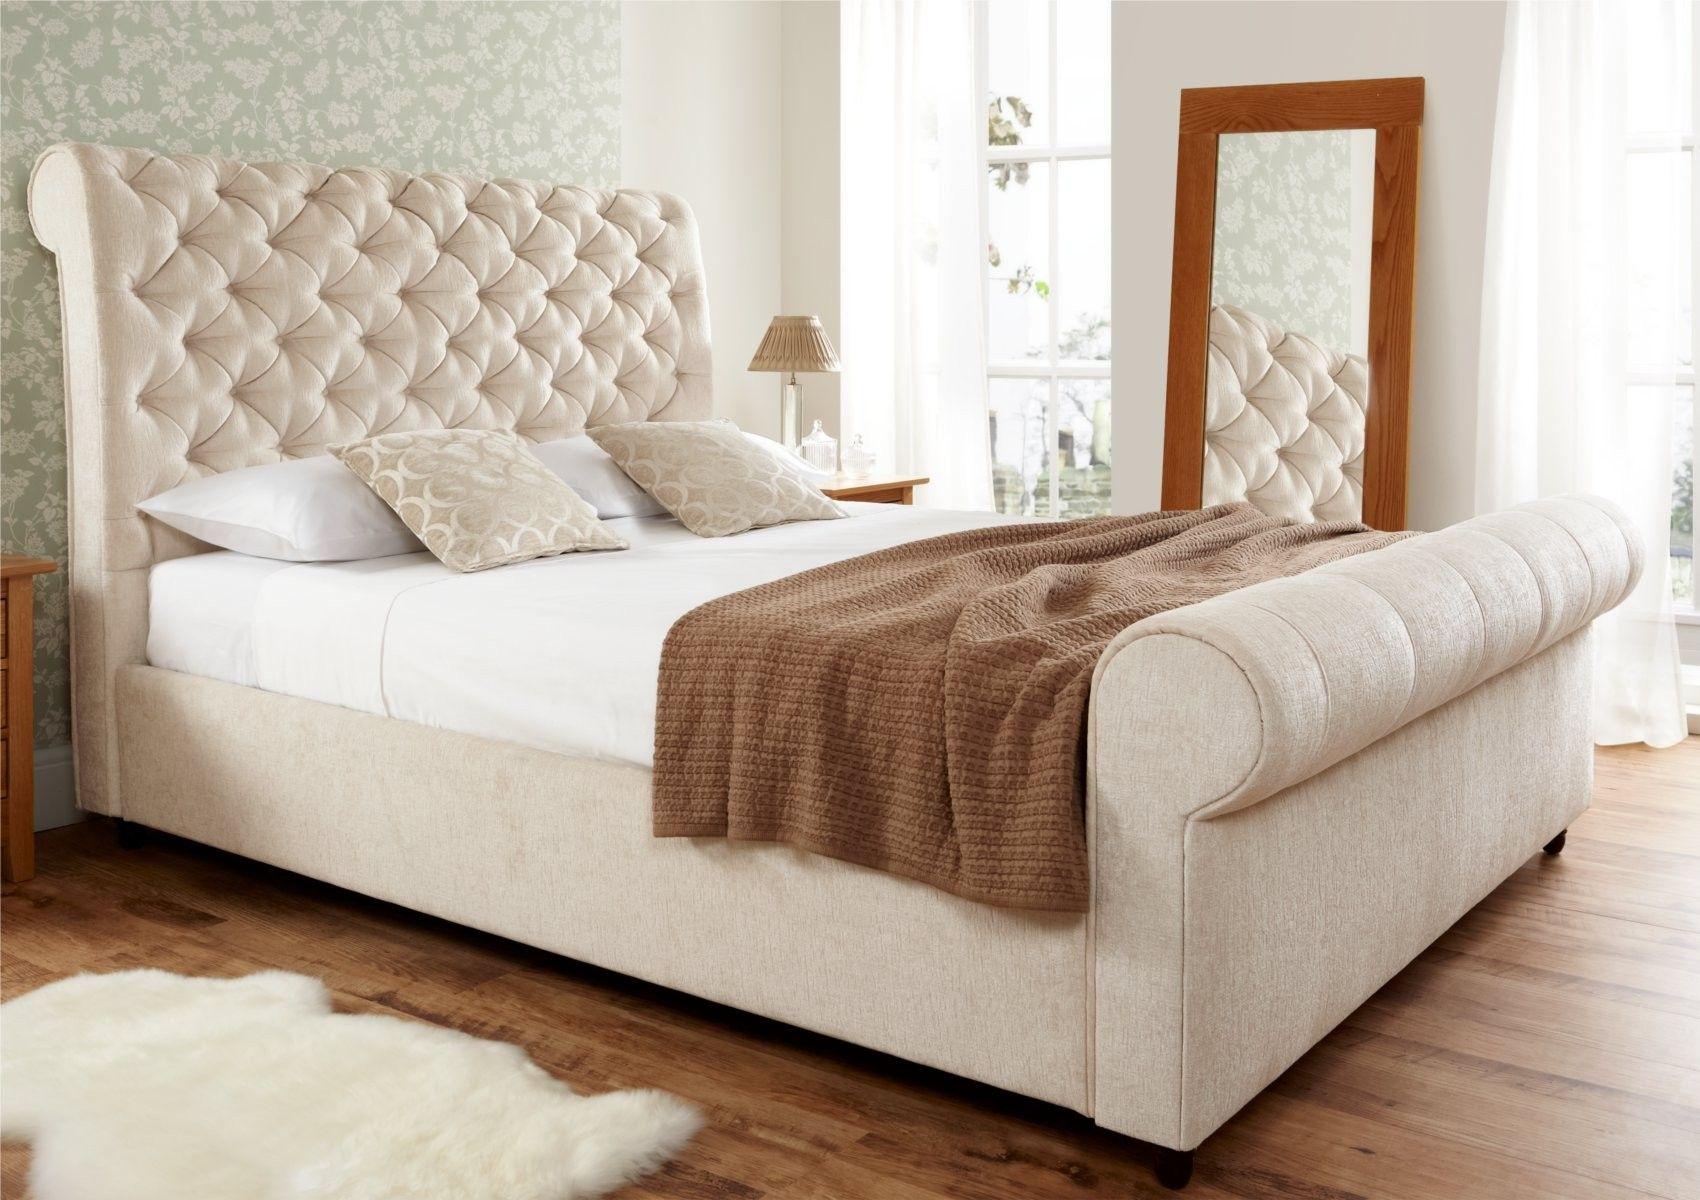 Elegance Upholstered Sleigh Bed